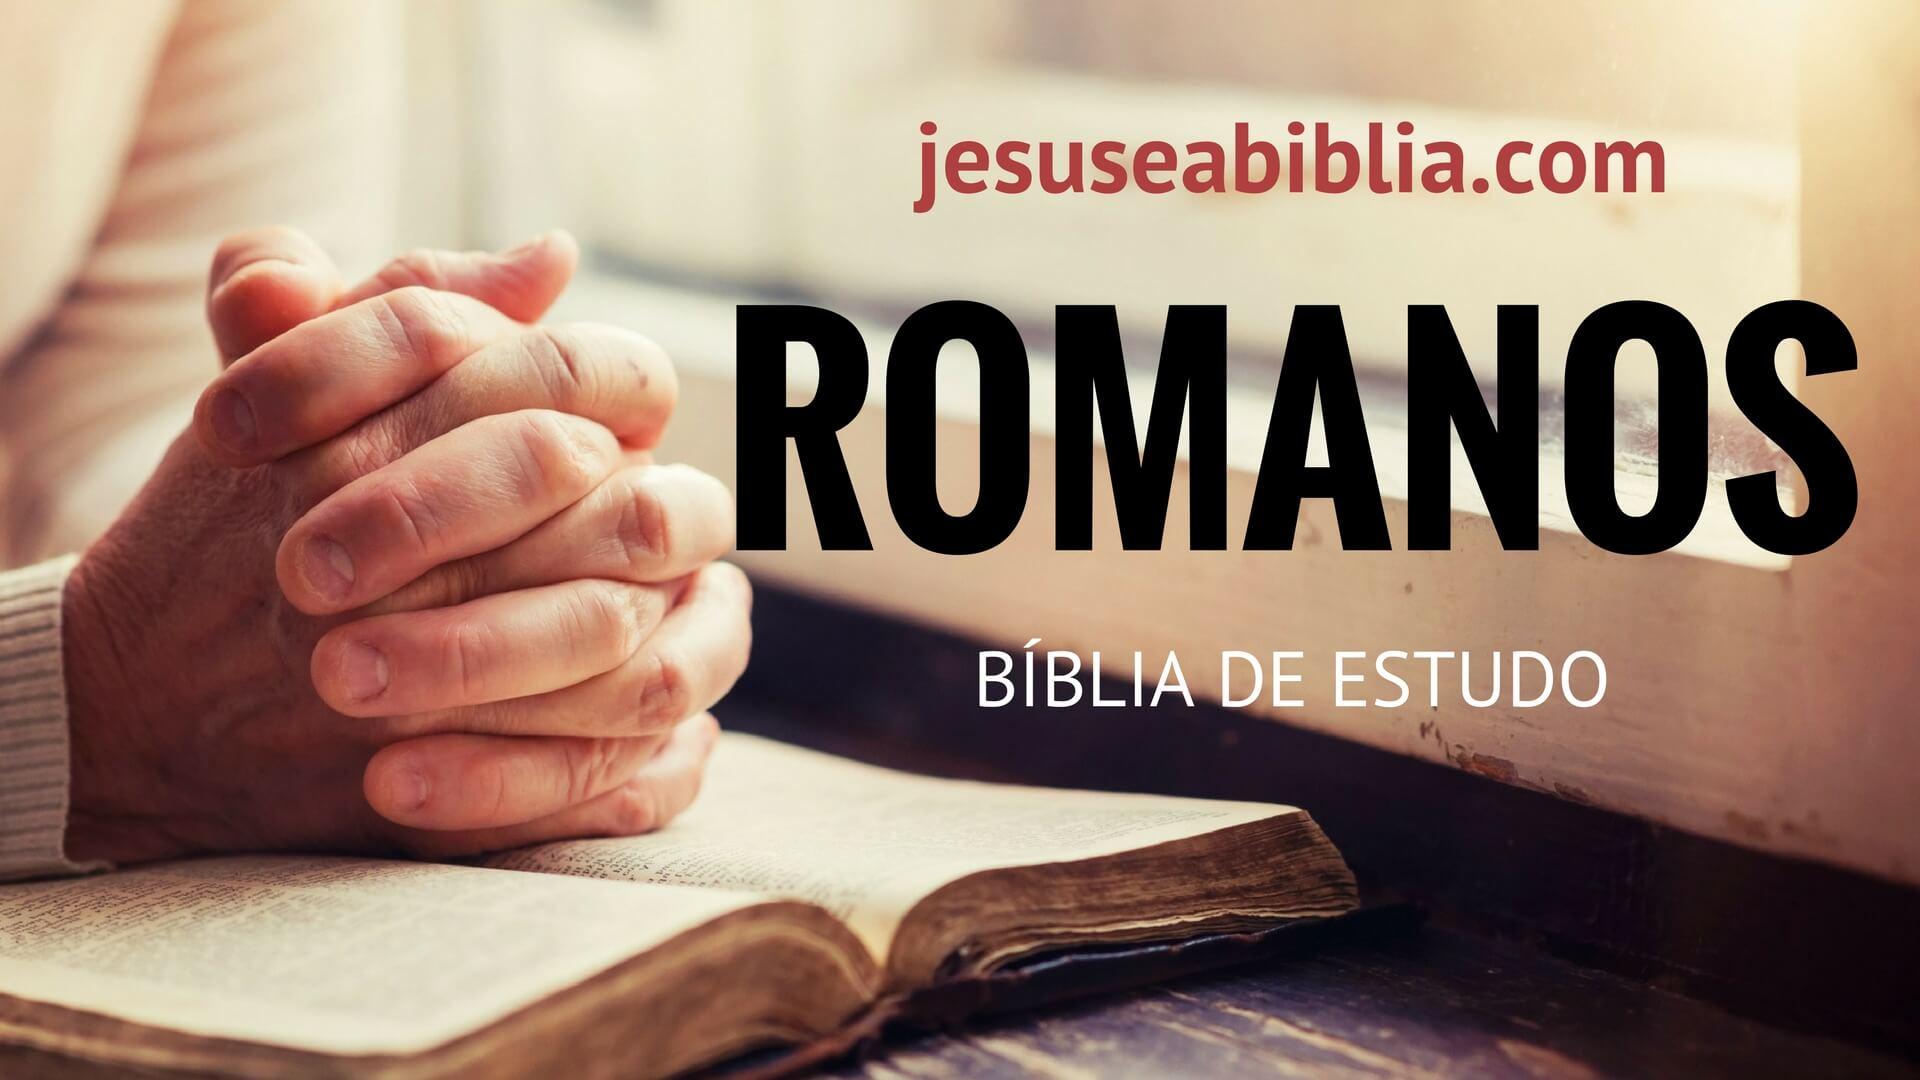 Romanos - Bíblia de Estudo Online